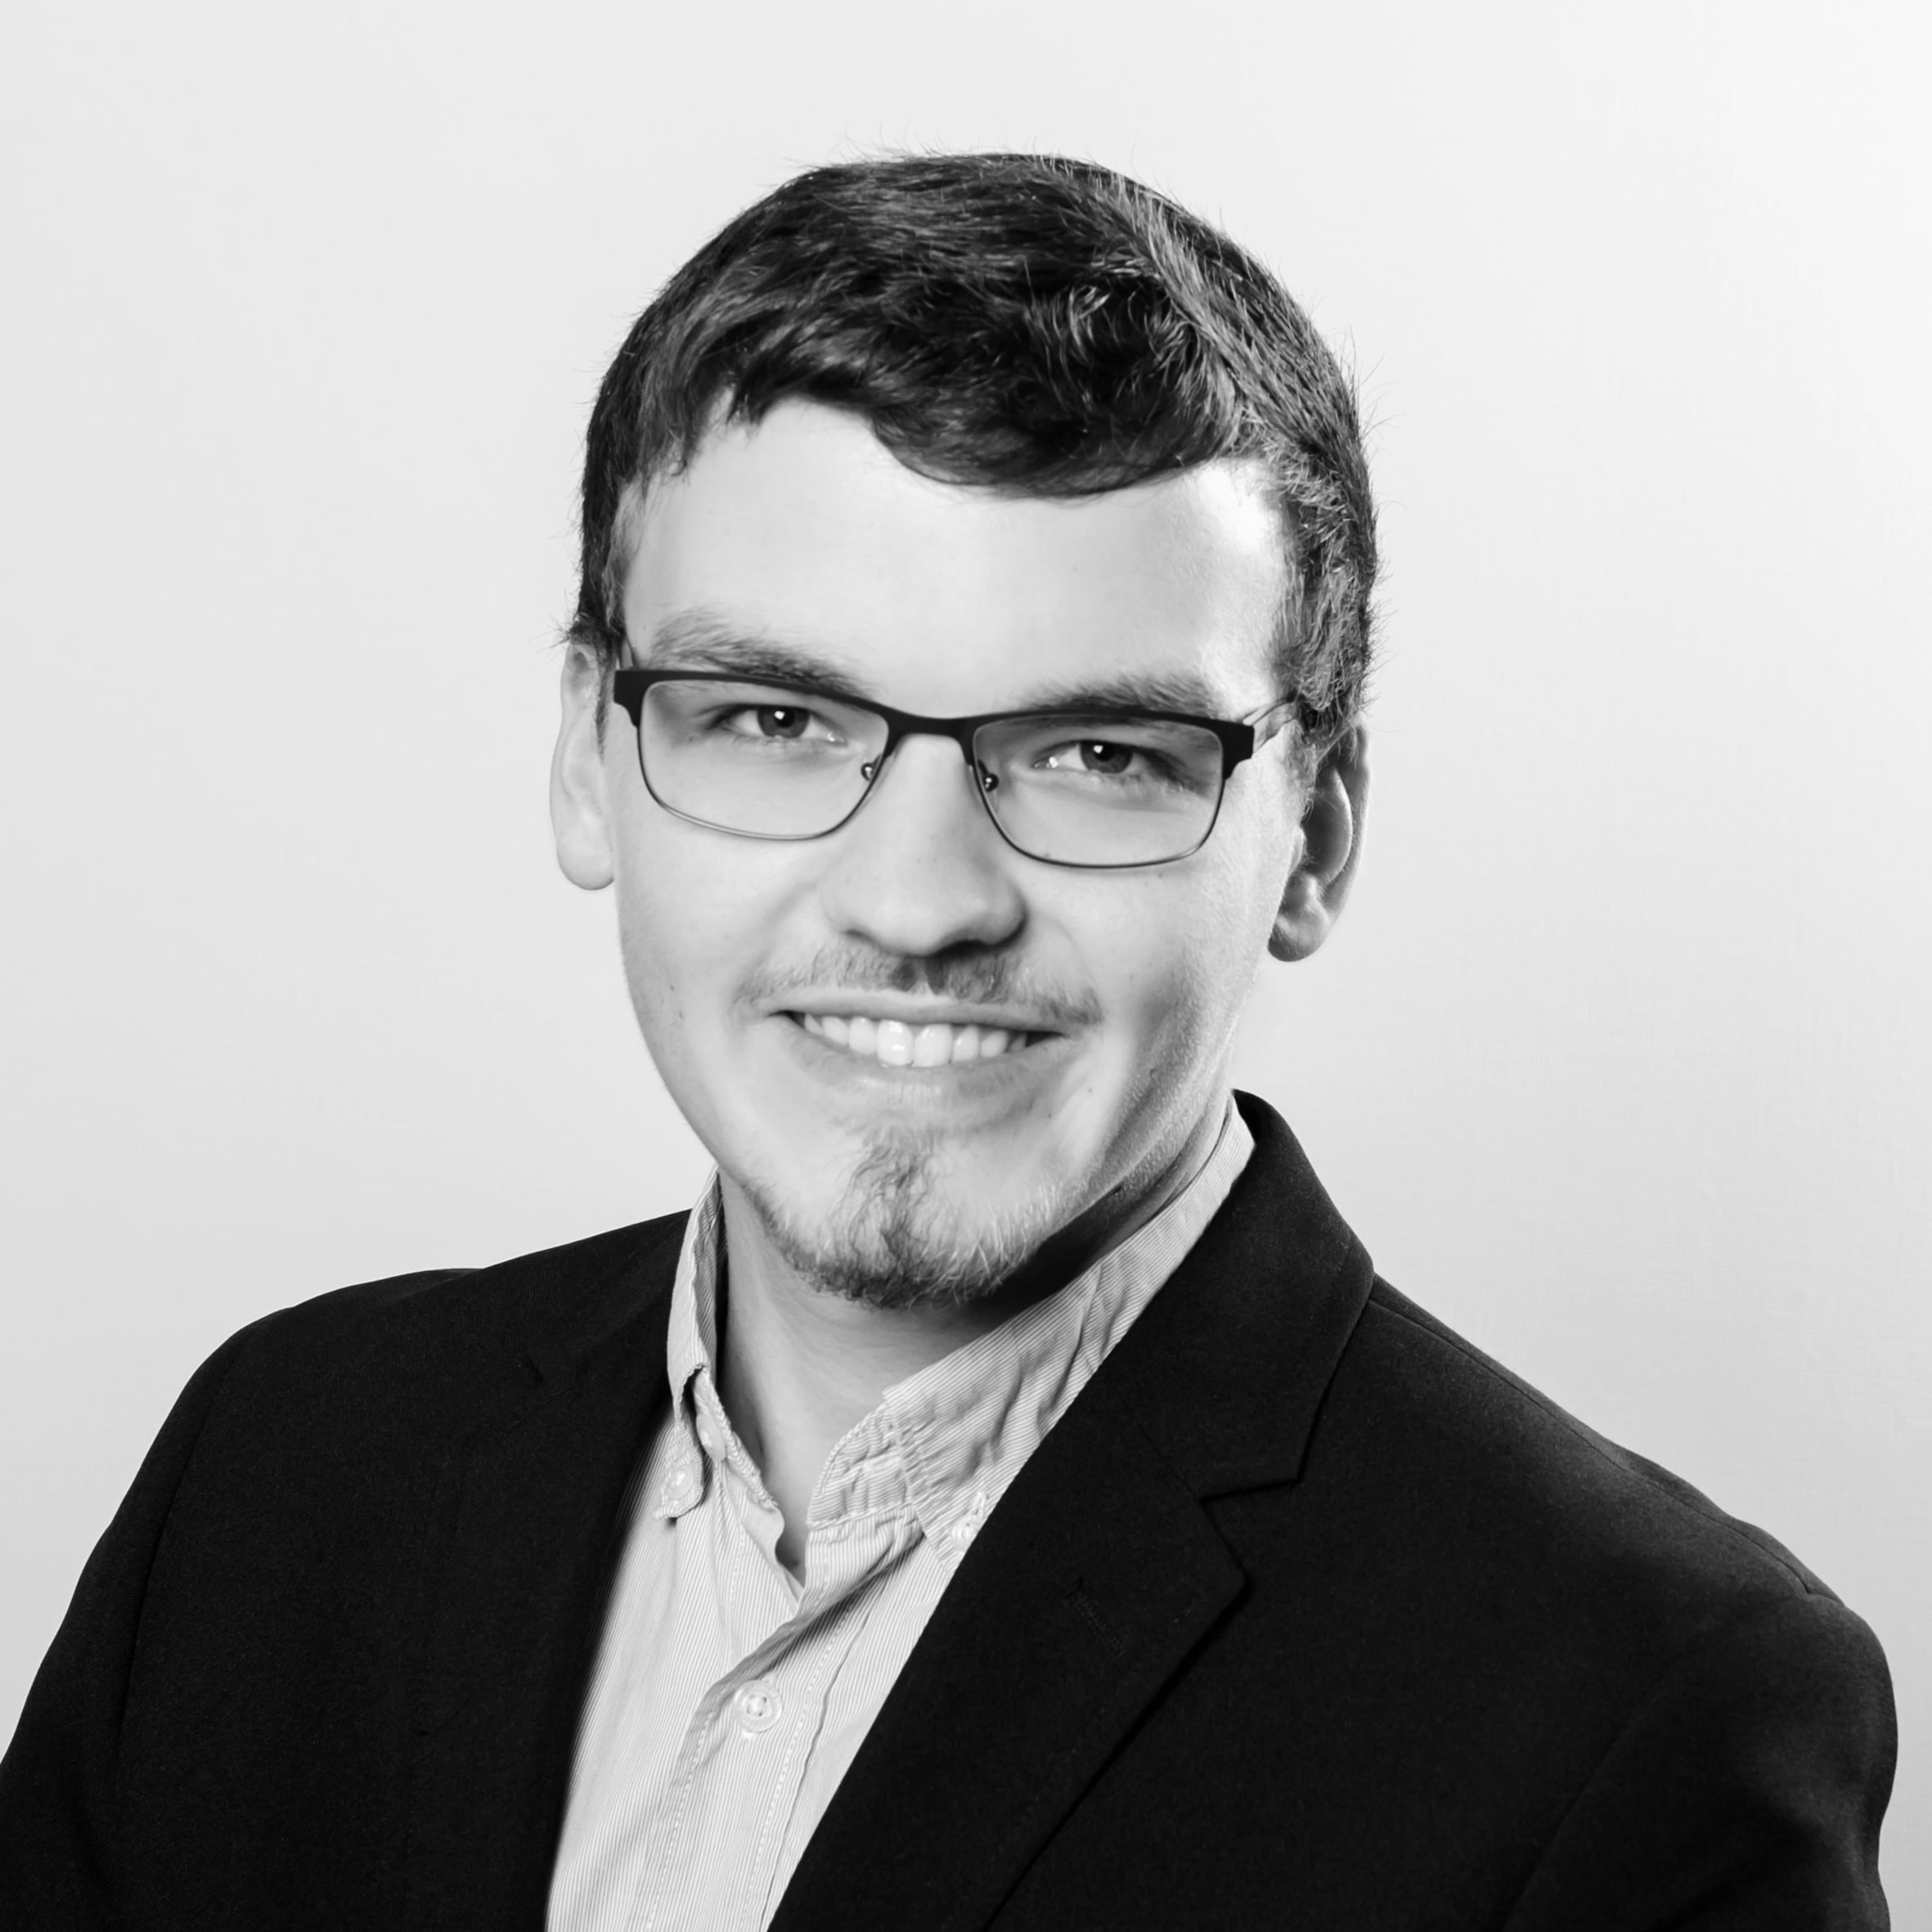 Marek Bangel